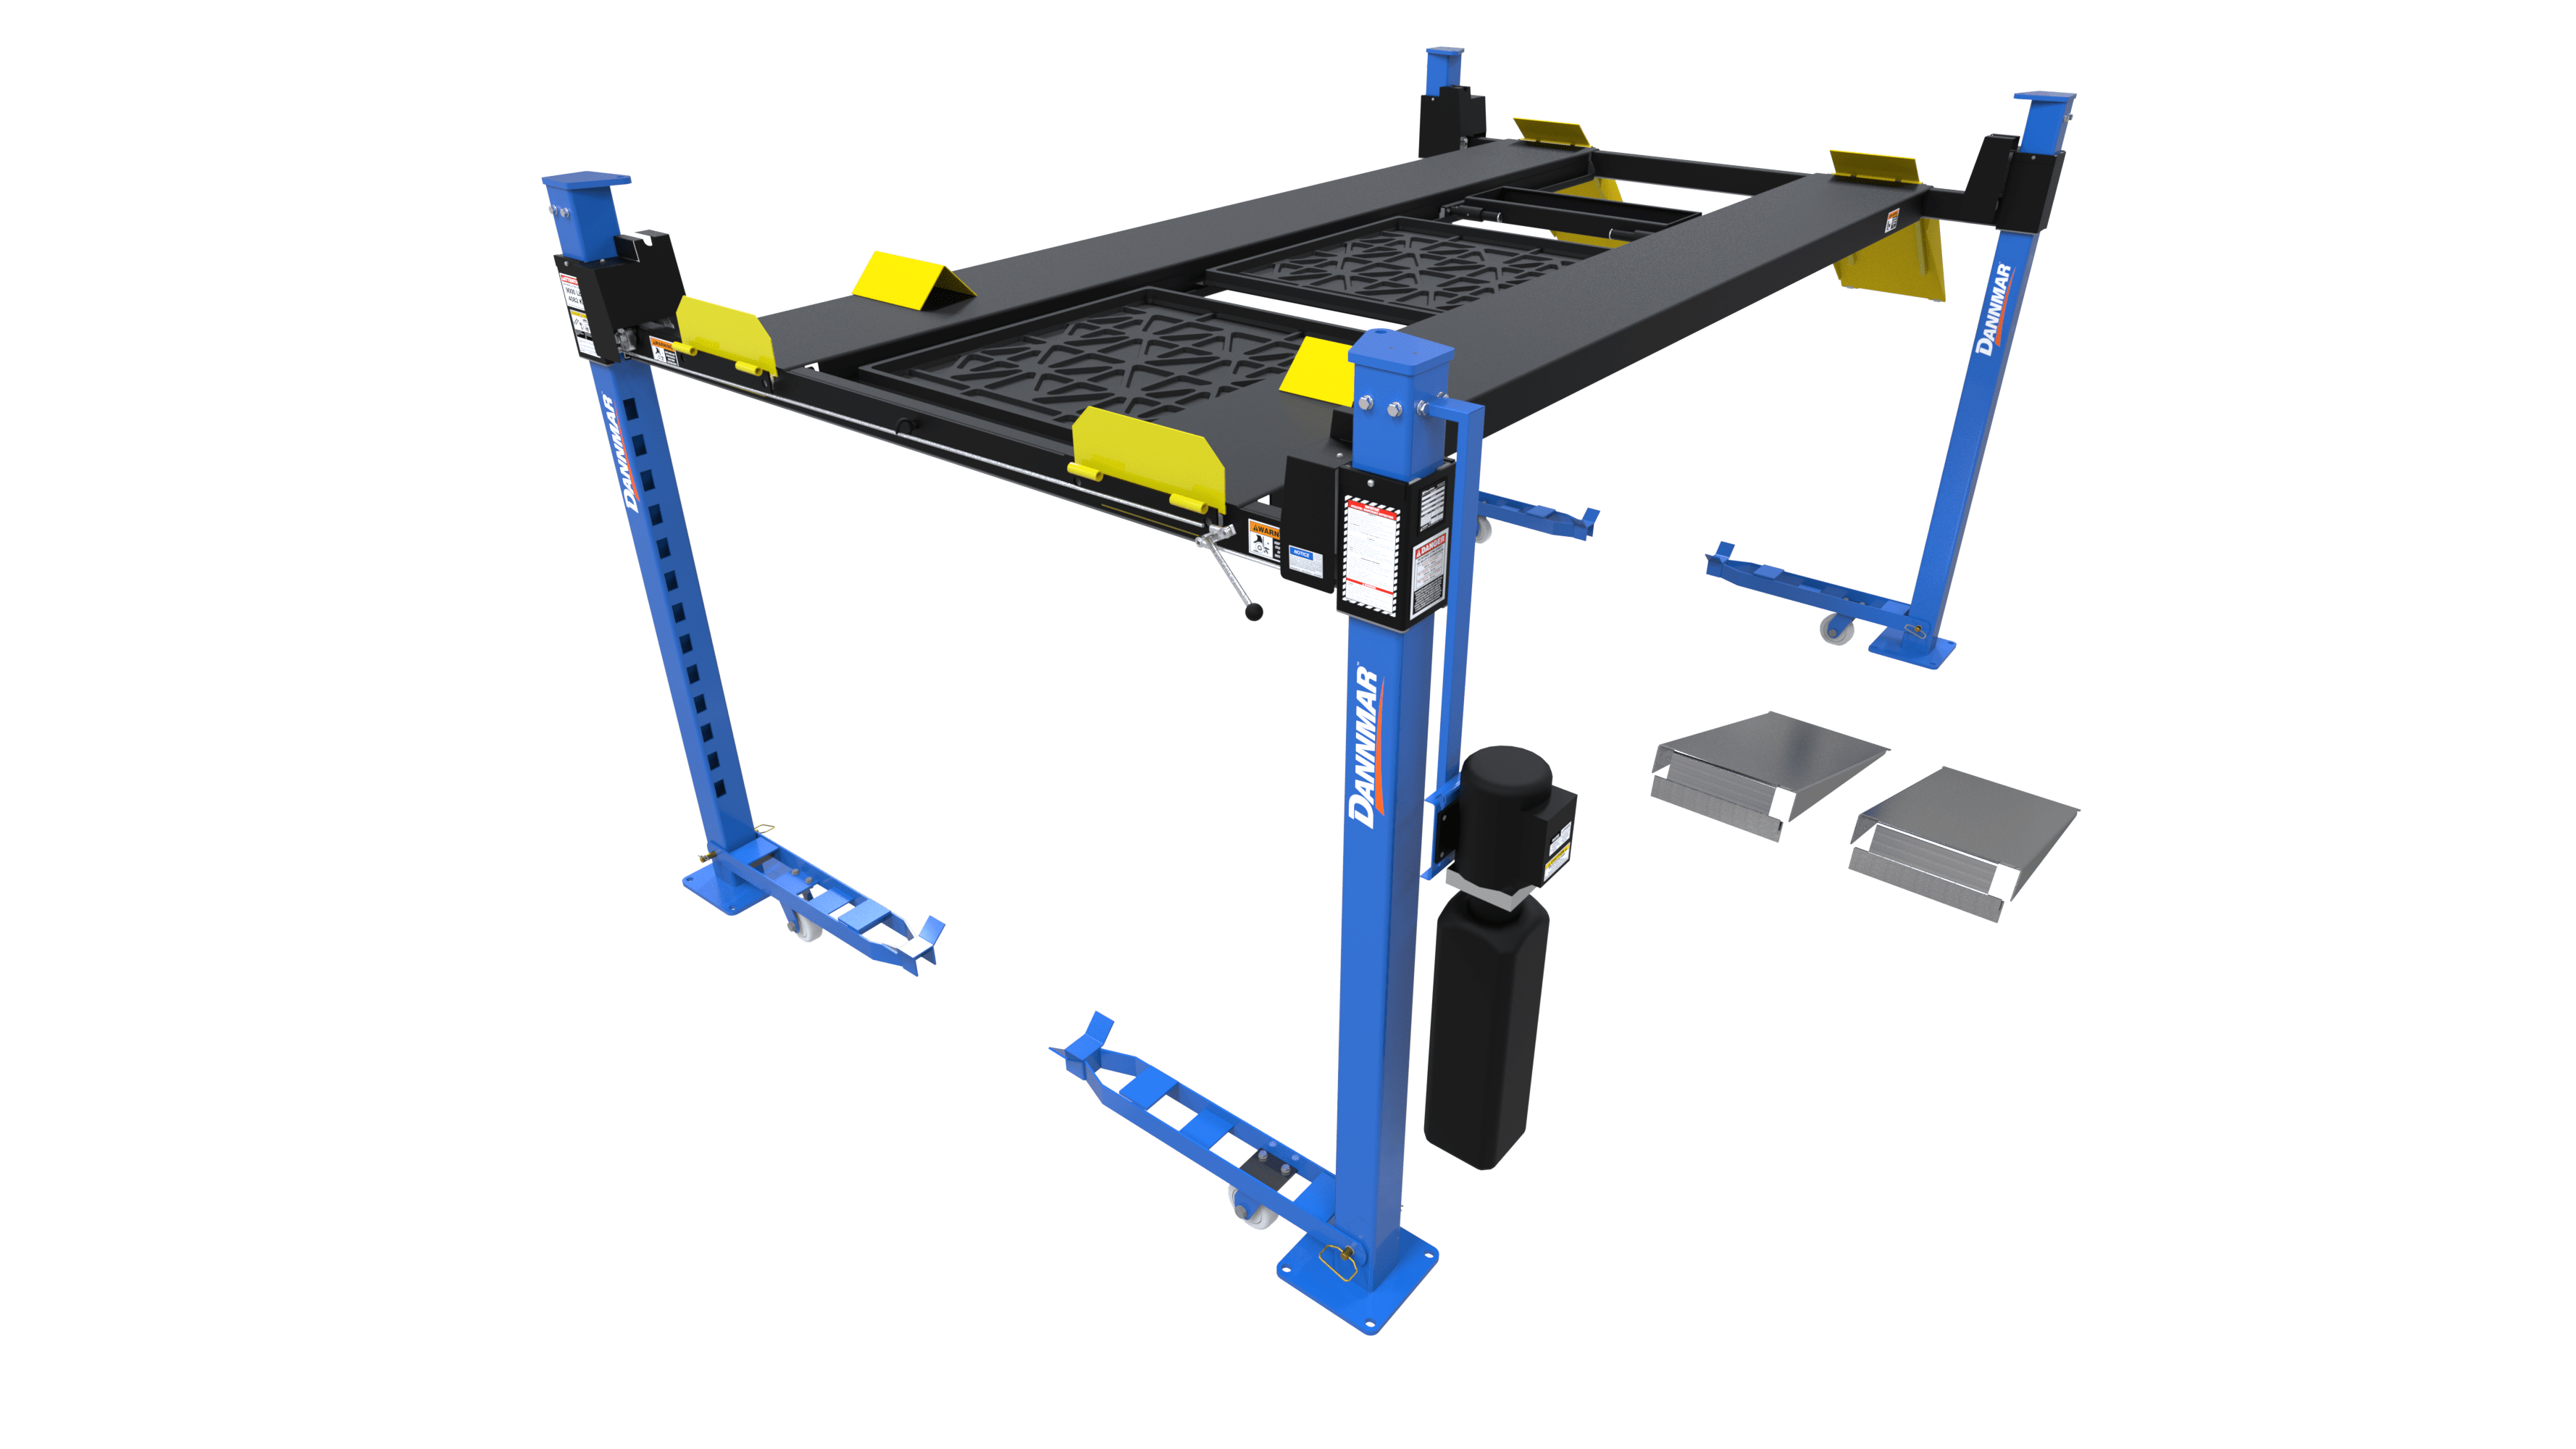 Dannmar D4-9 9,000 4 Post Lift Package